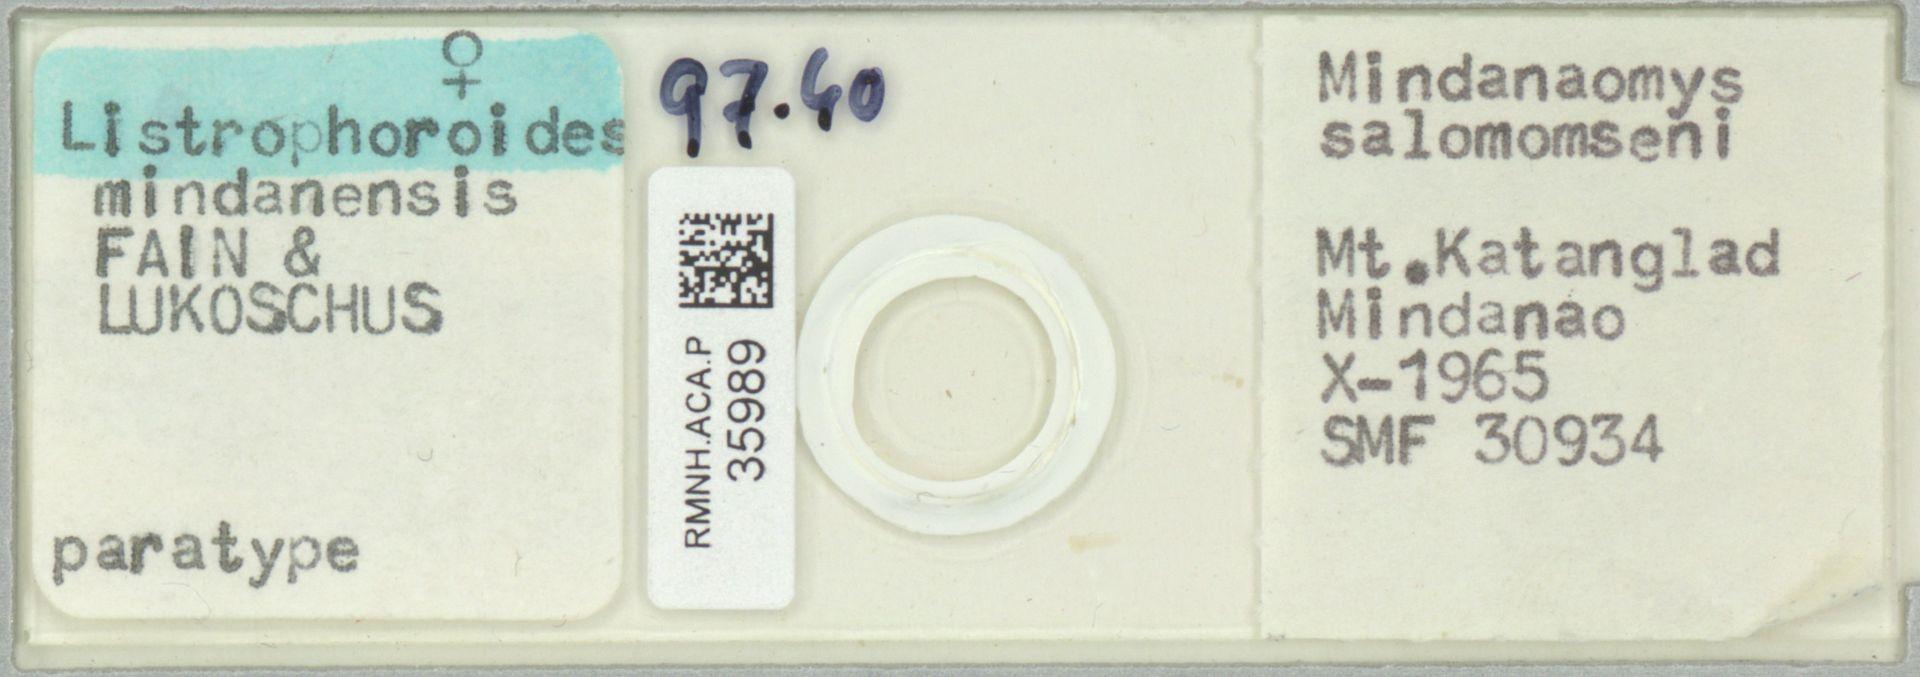 RMNH.ACA.P.35989 | Listrophoroides mindanensis Fain & Lukoschus